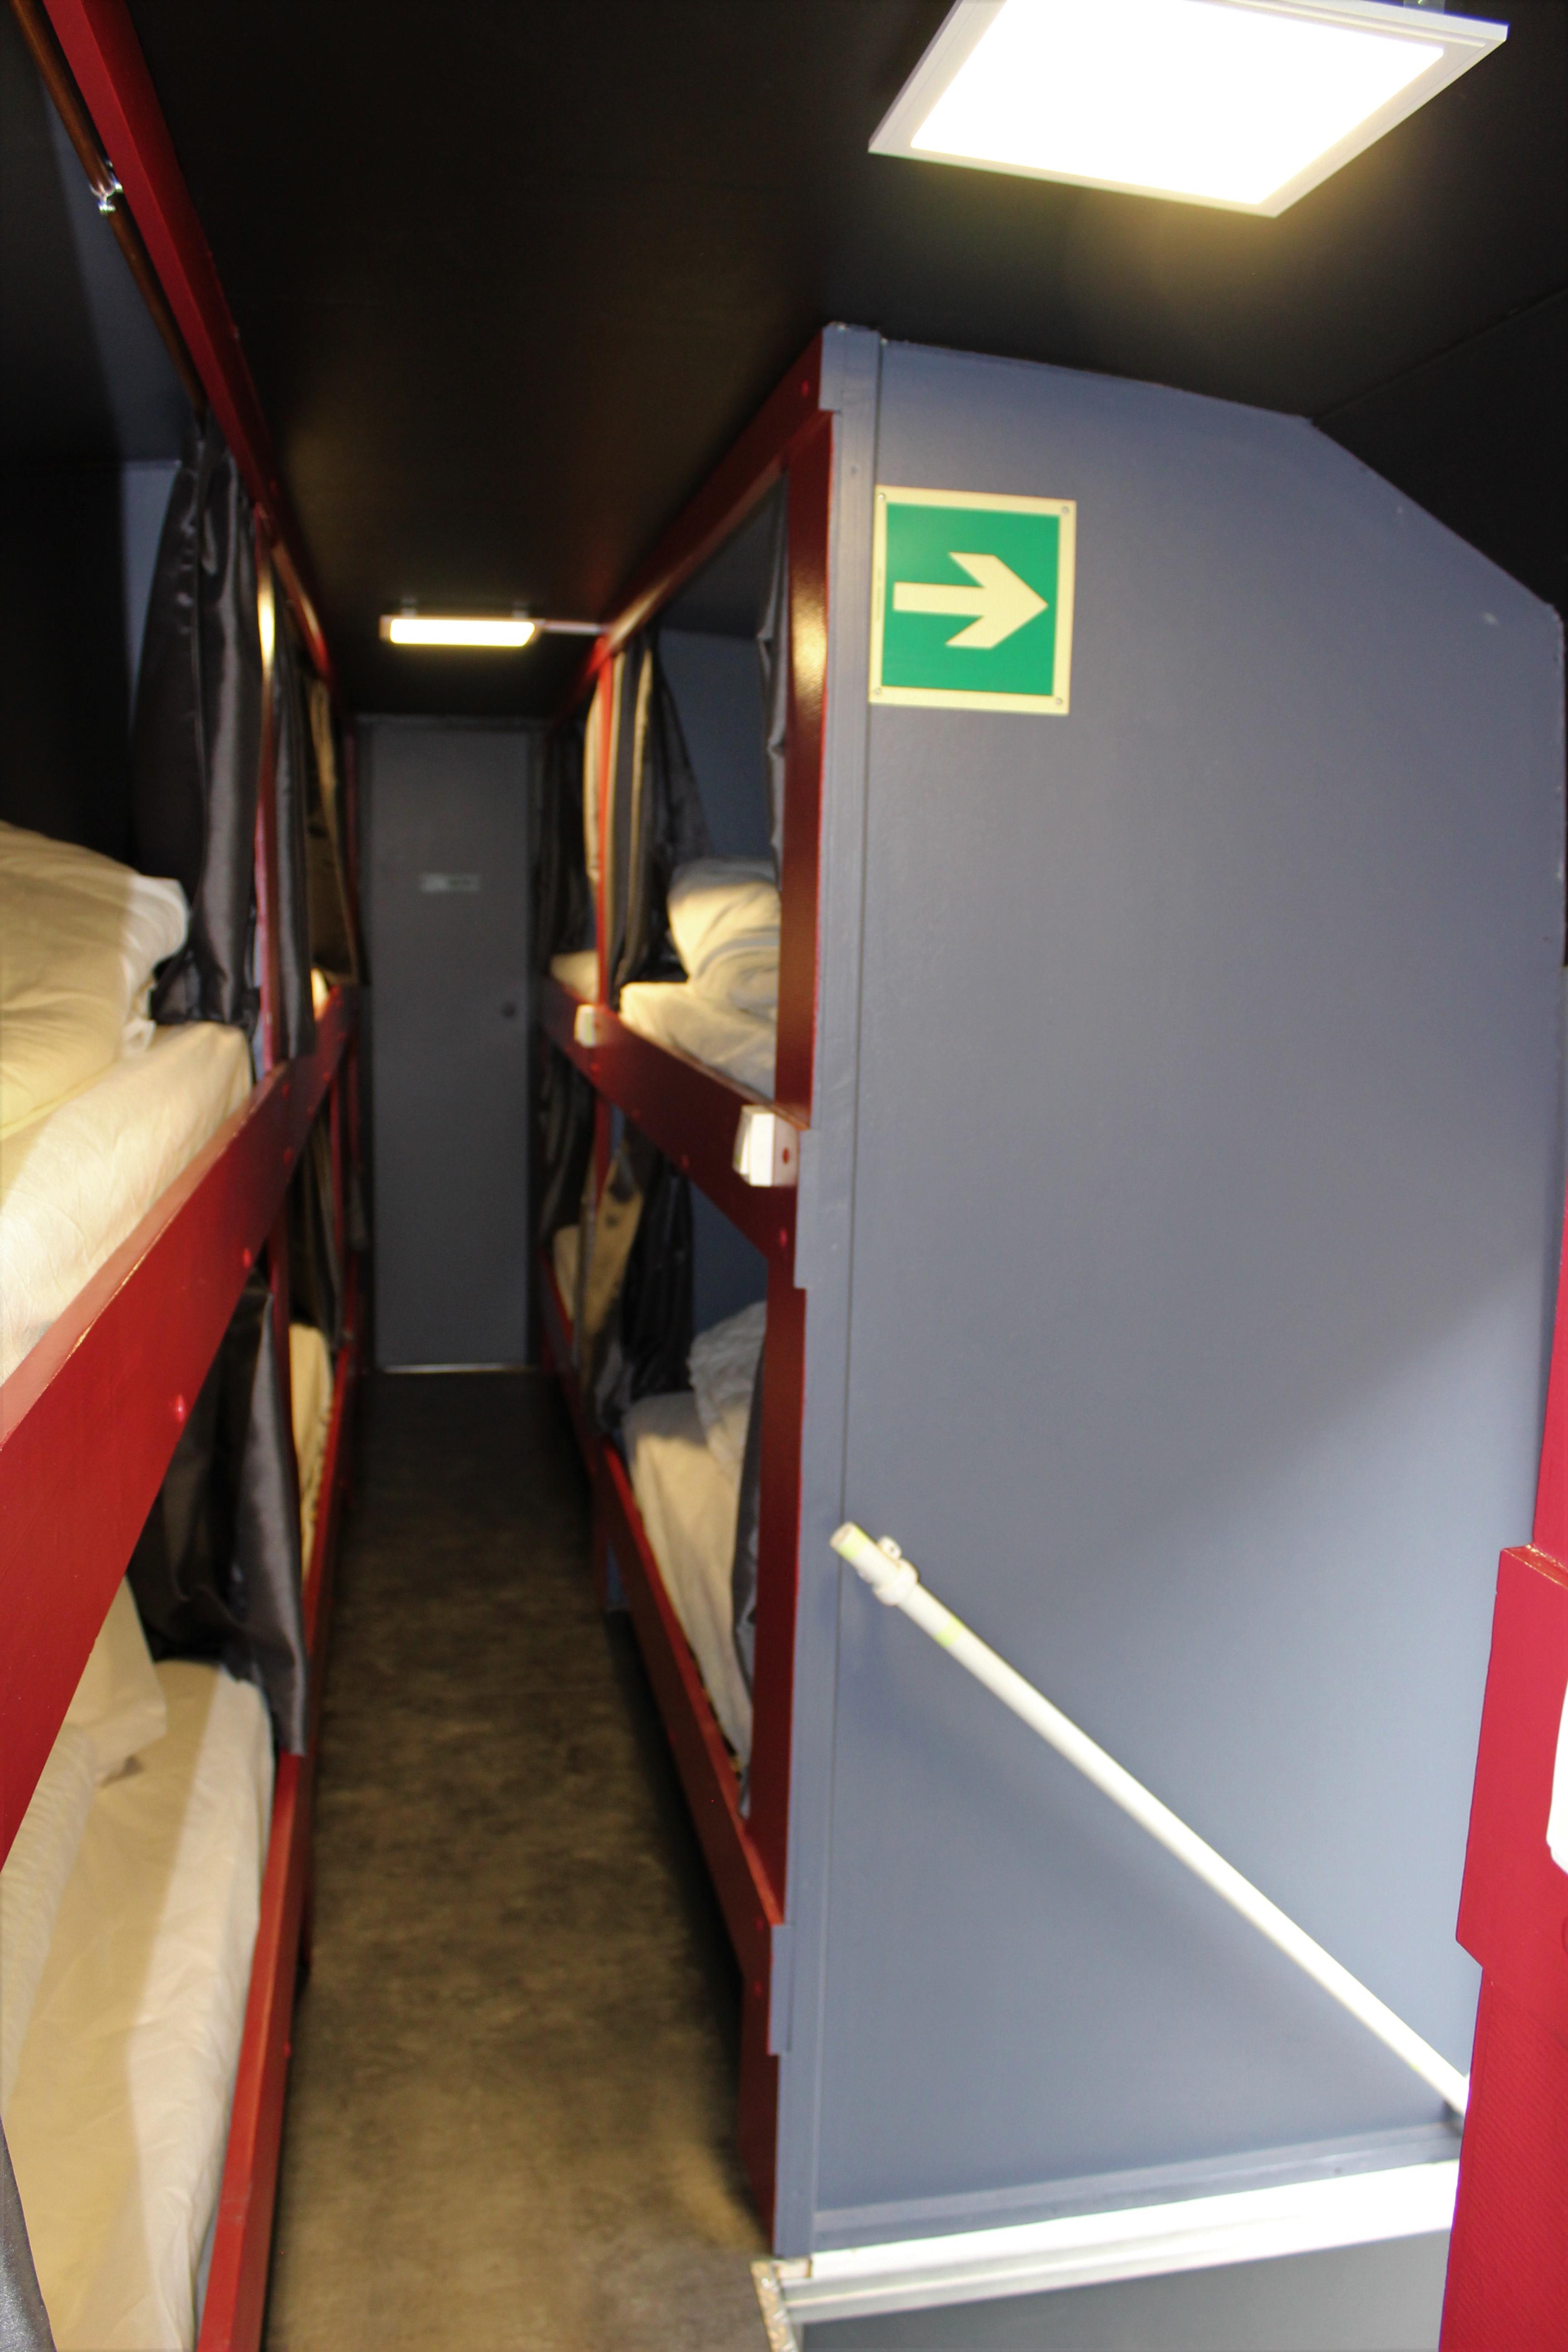 bus aménagé en dortoir 16 lits